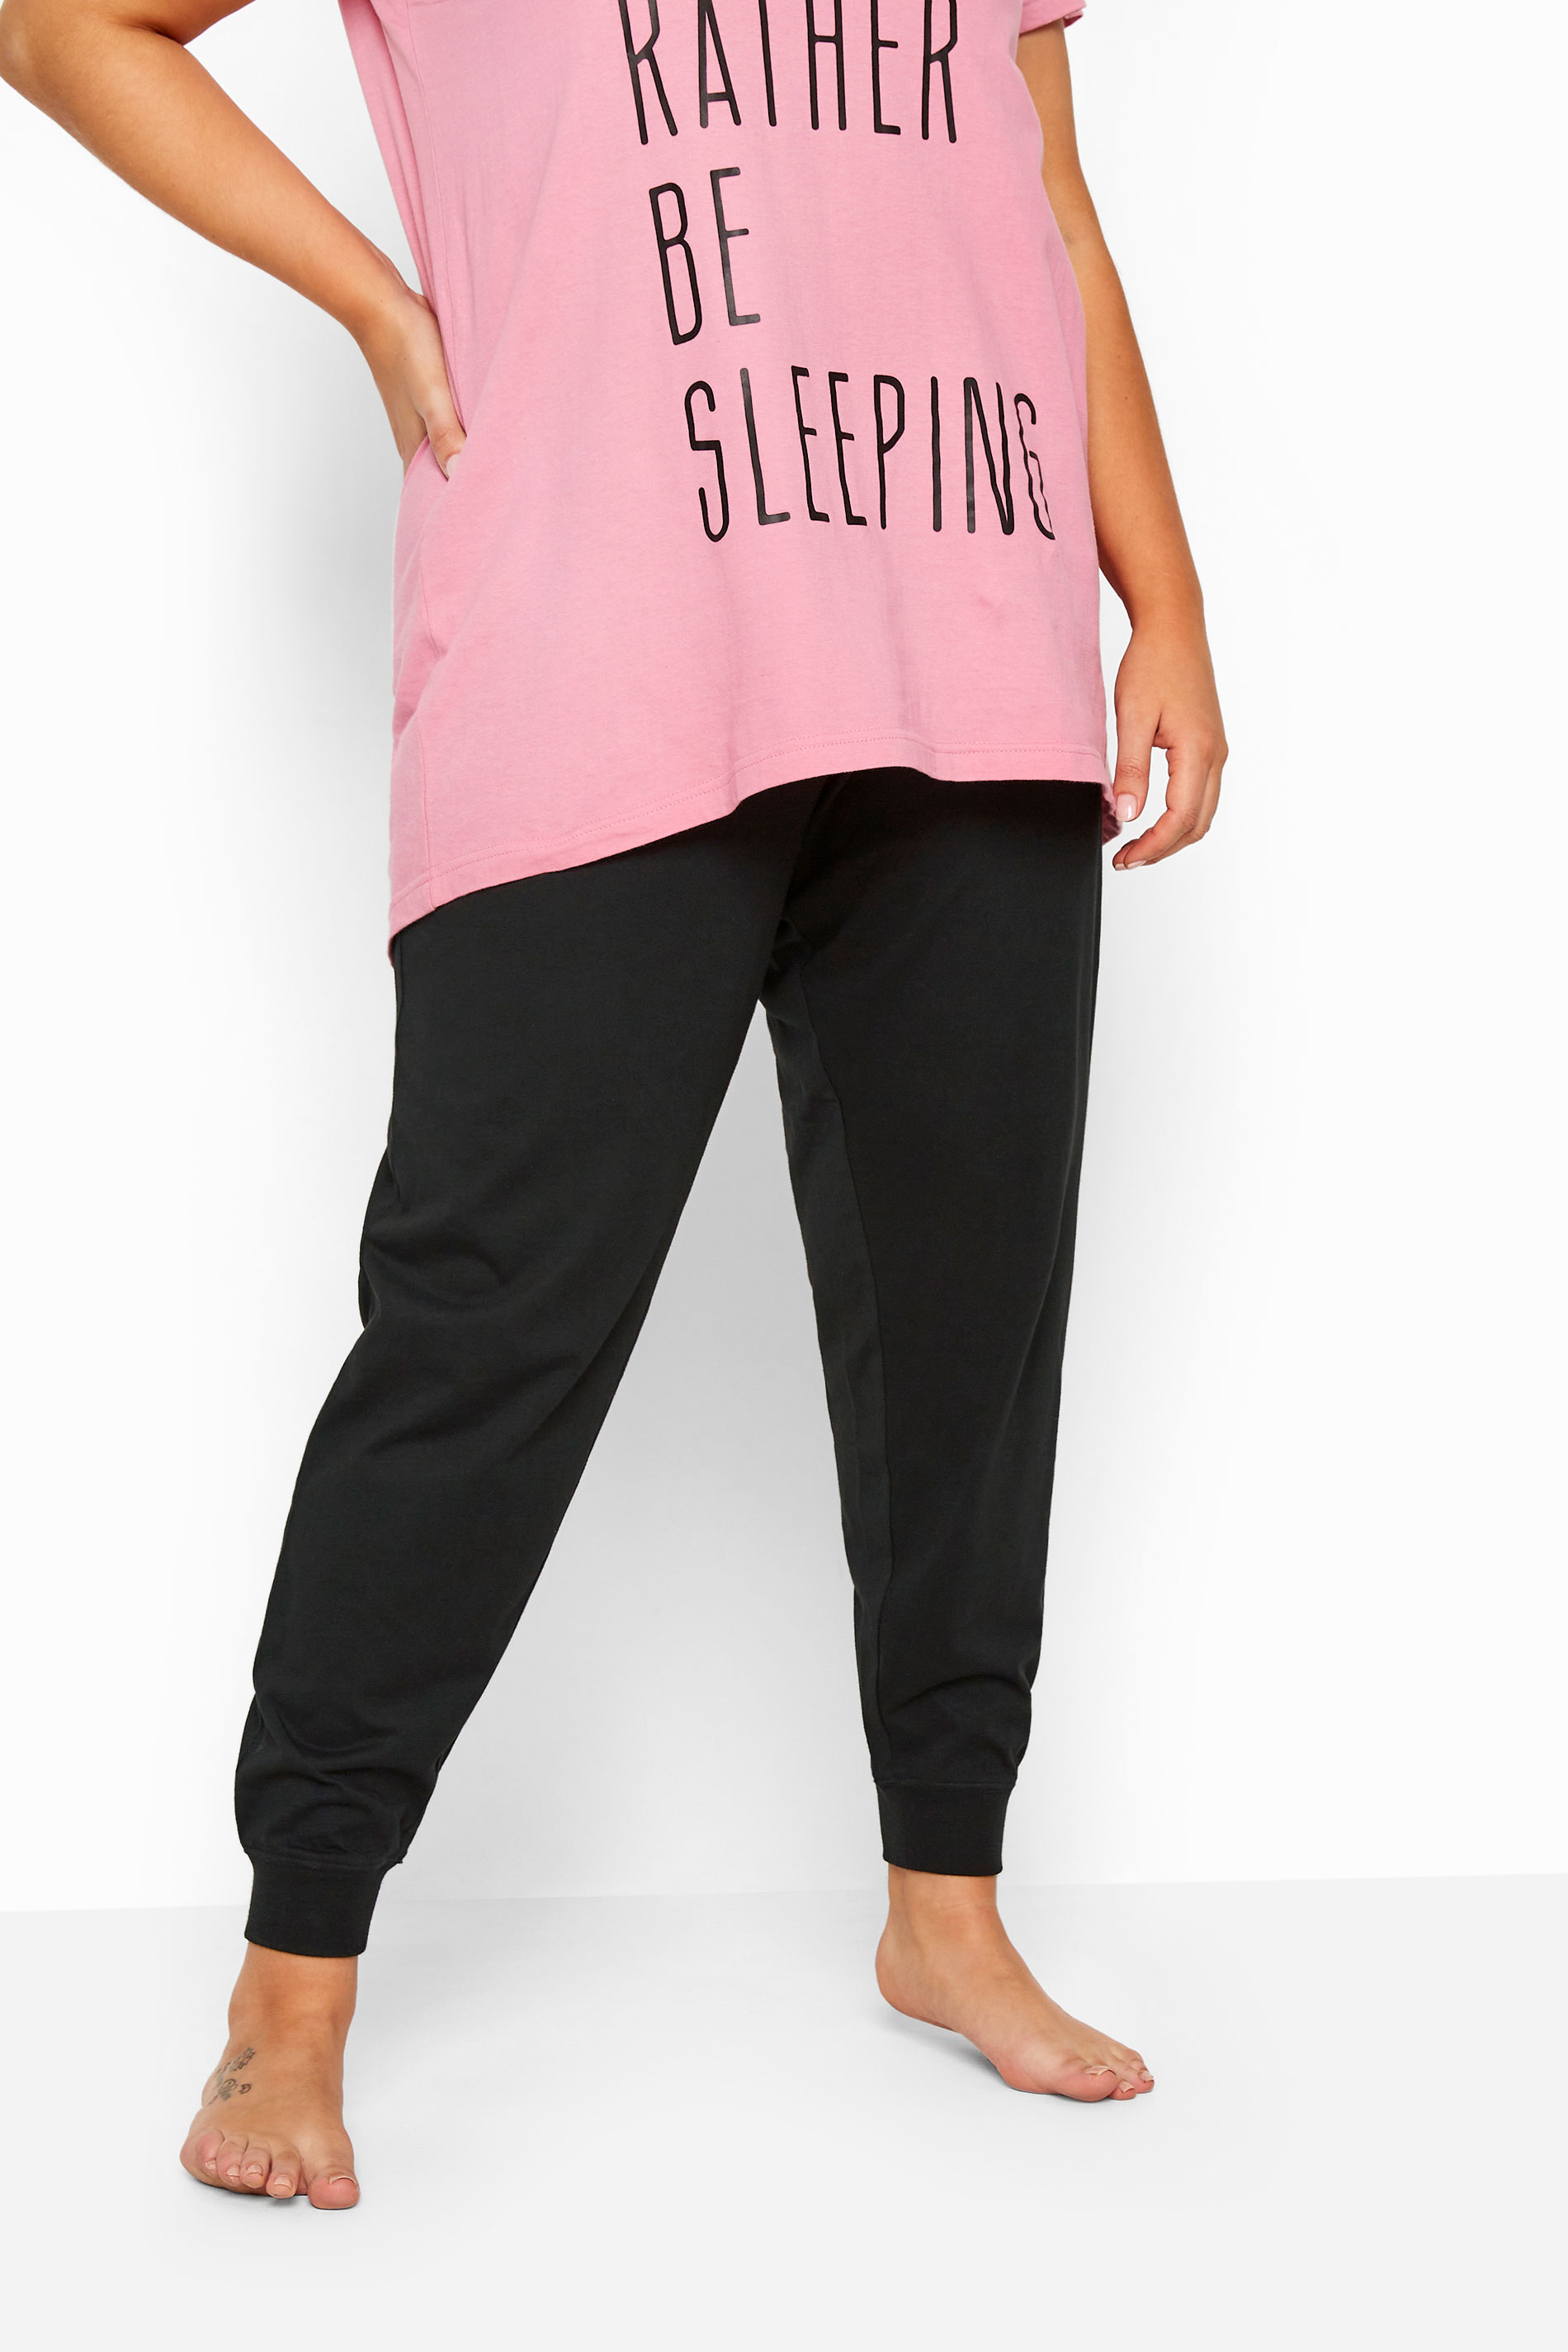 Black Cuffed Pyjama Bottoms_148481B.jpg